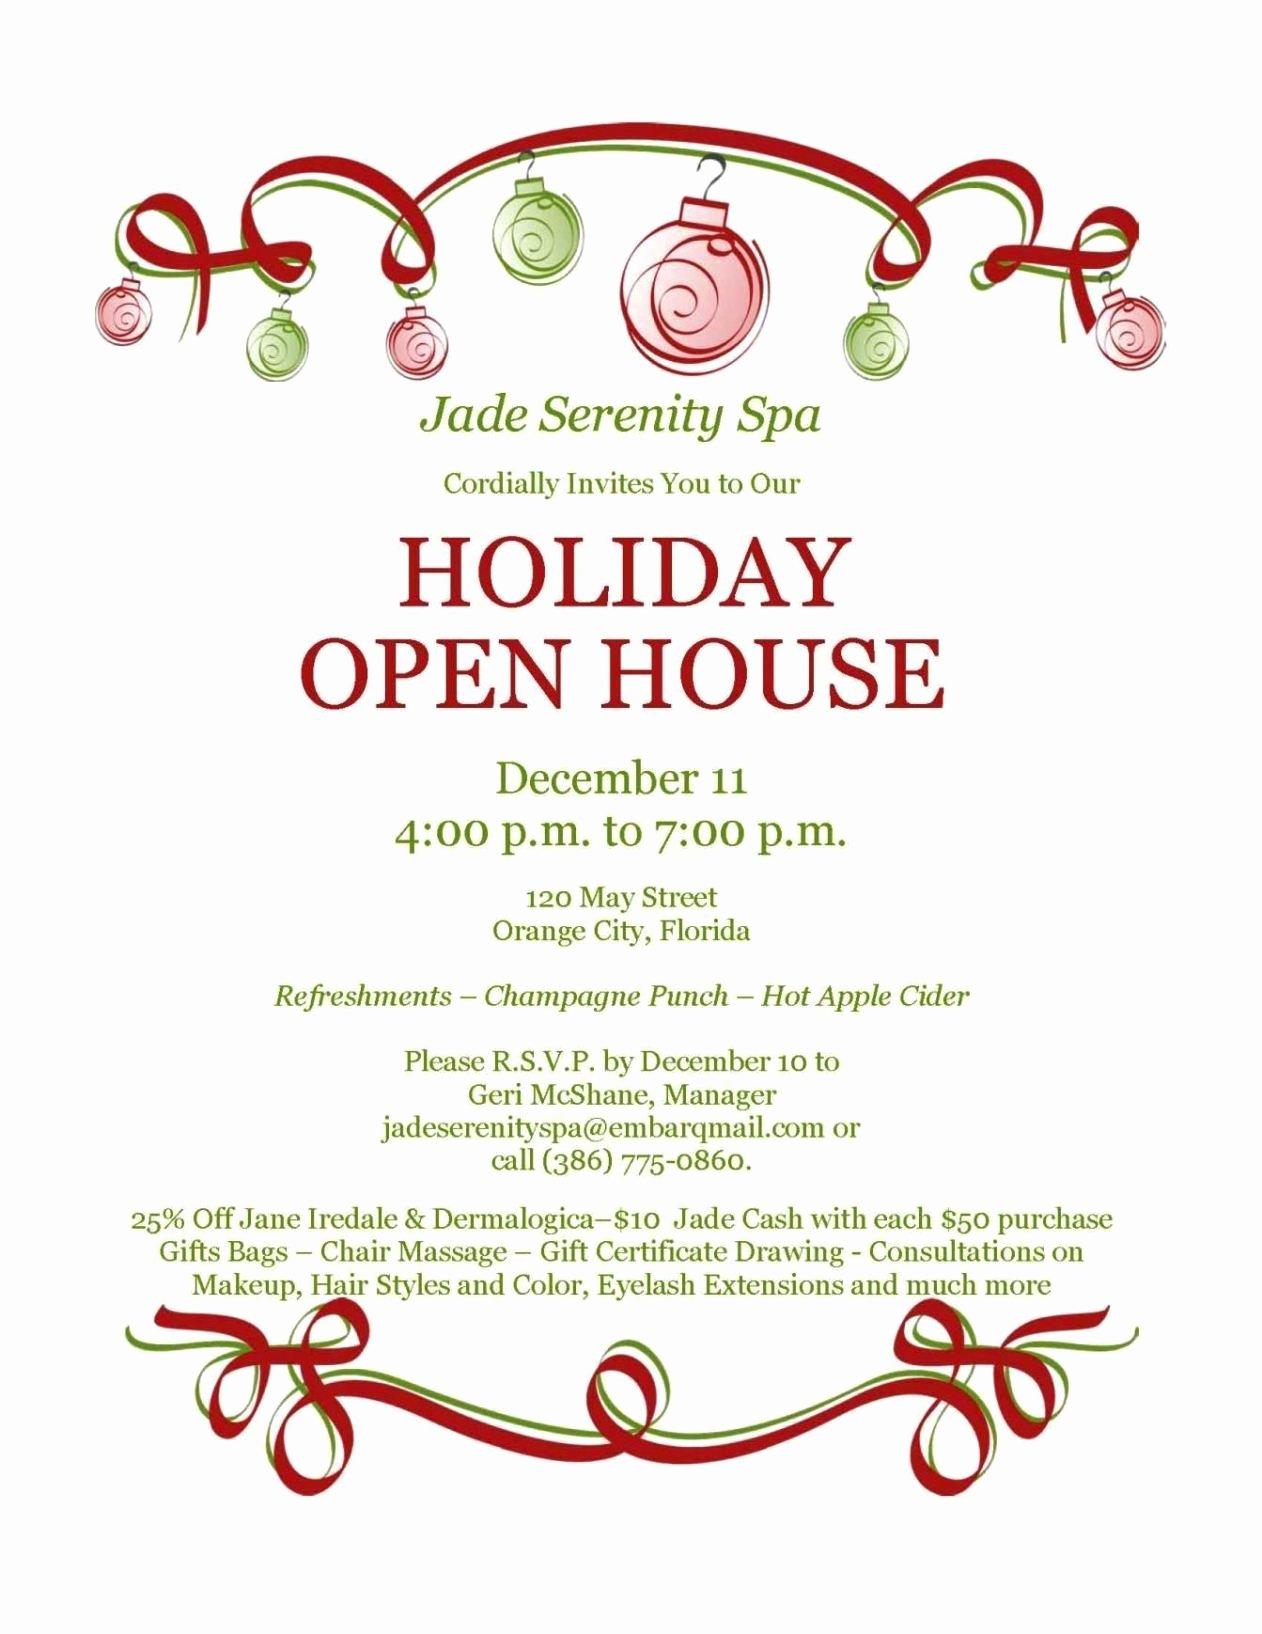 Open House Invitation Templates Free Inspirational Free Open House Invitation Template Sampletemplatess Sampletemplatess